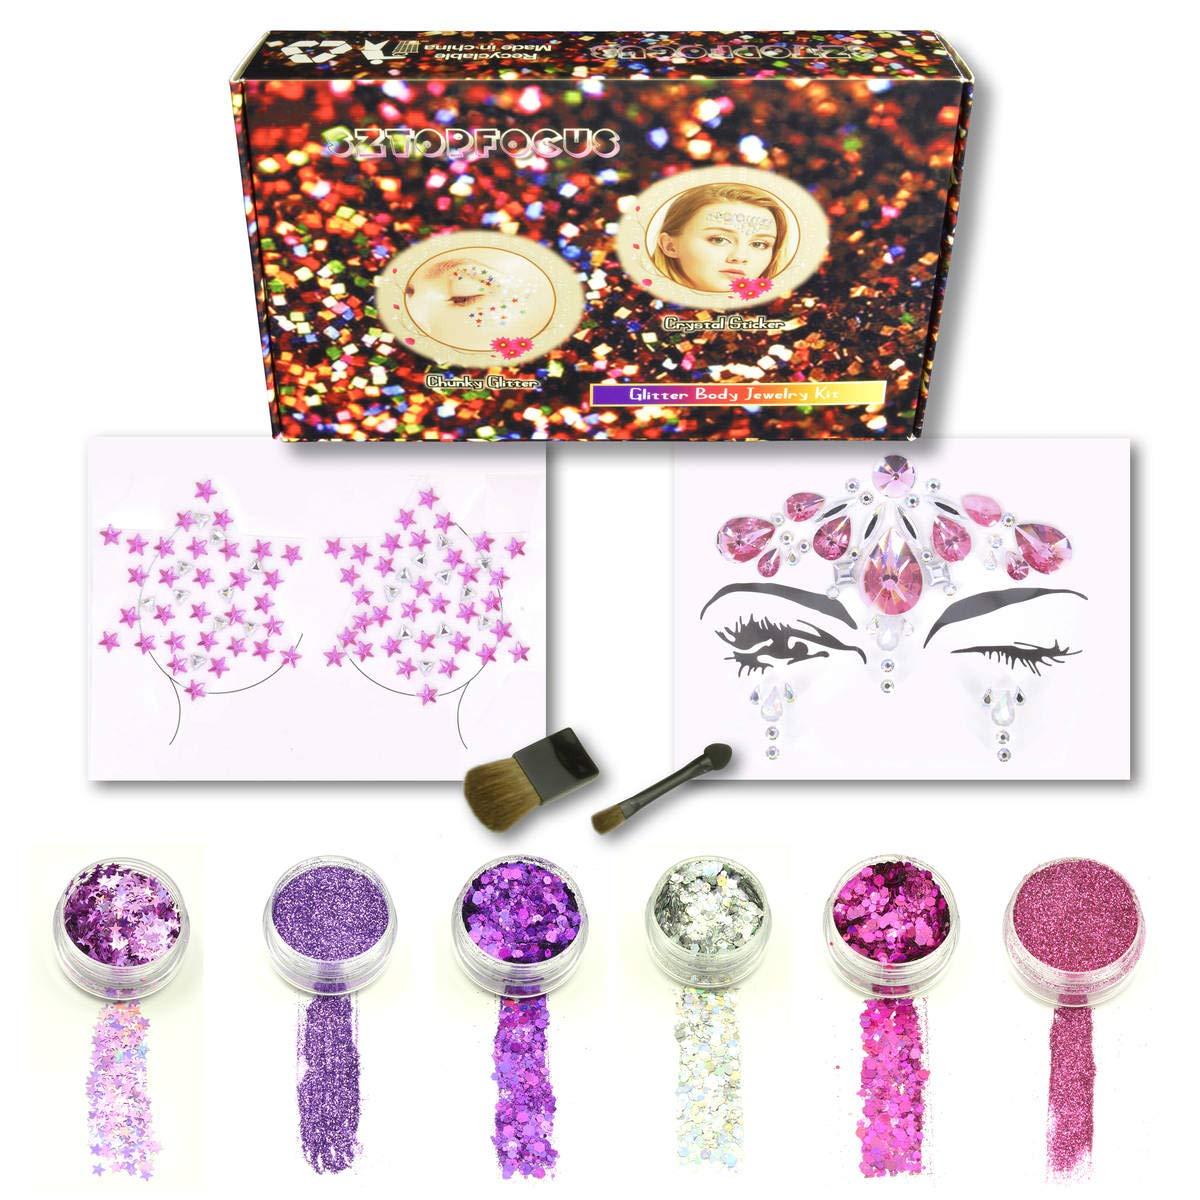 Face jewels Festival Body Jewelry Set Holographic Glitter Powder Cosmetic Makeup Chunky Tattoo Kit Hair Eye Rhinestones Stick On (GS-02)